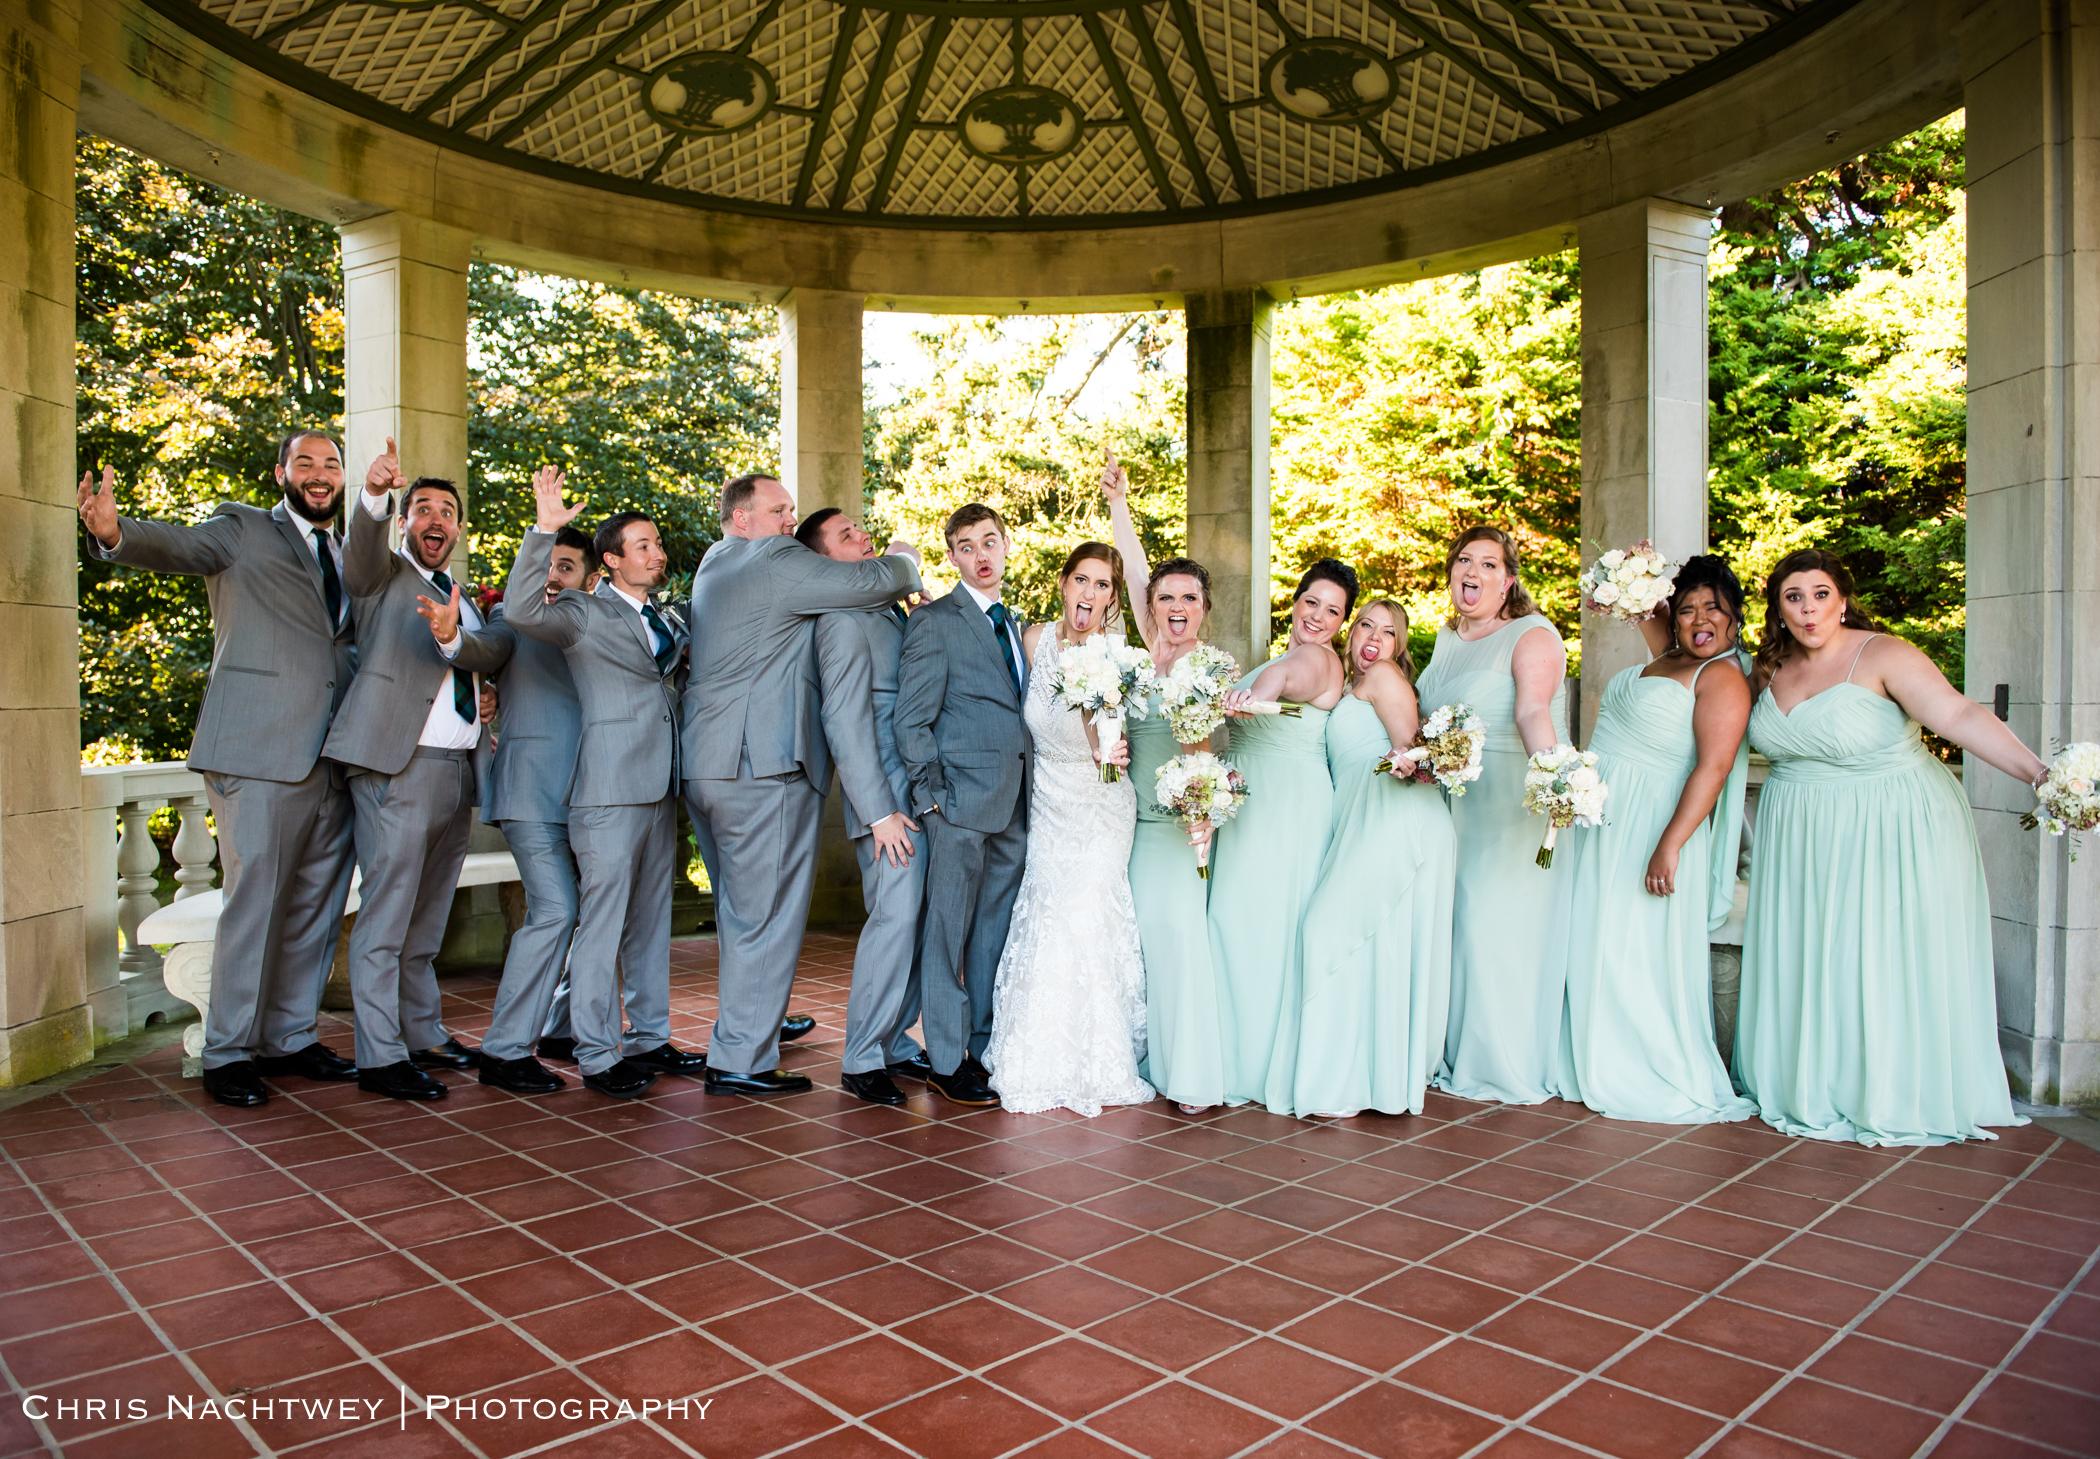 harkness-wedding-photos-chris-nachtwey-photography-2018-16.jpg